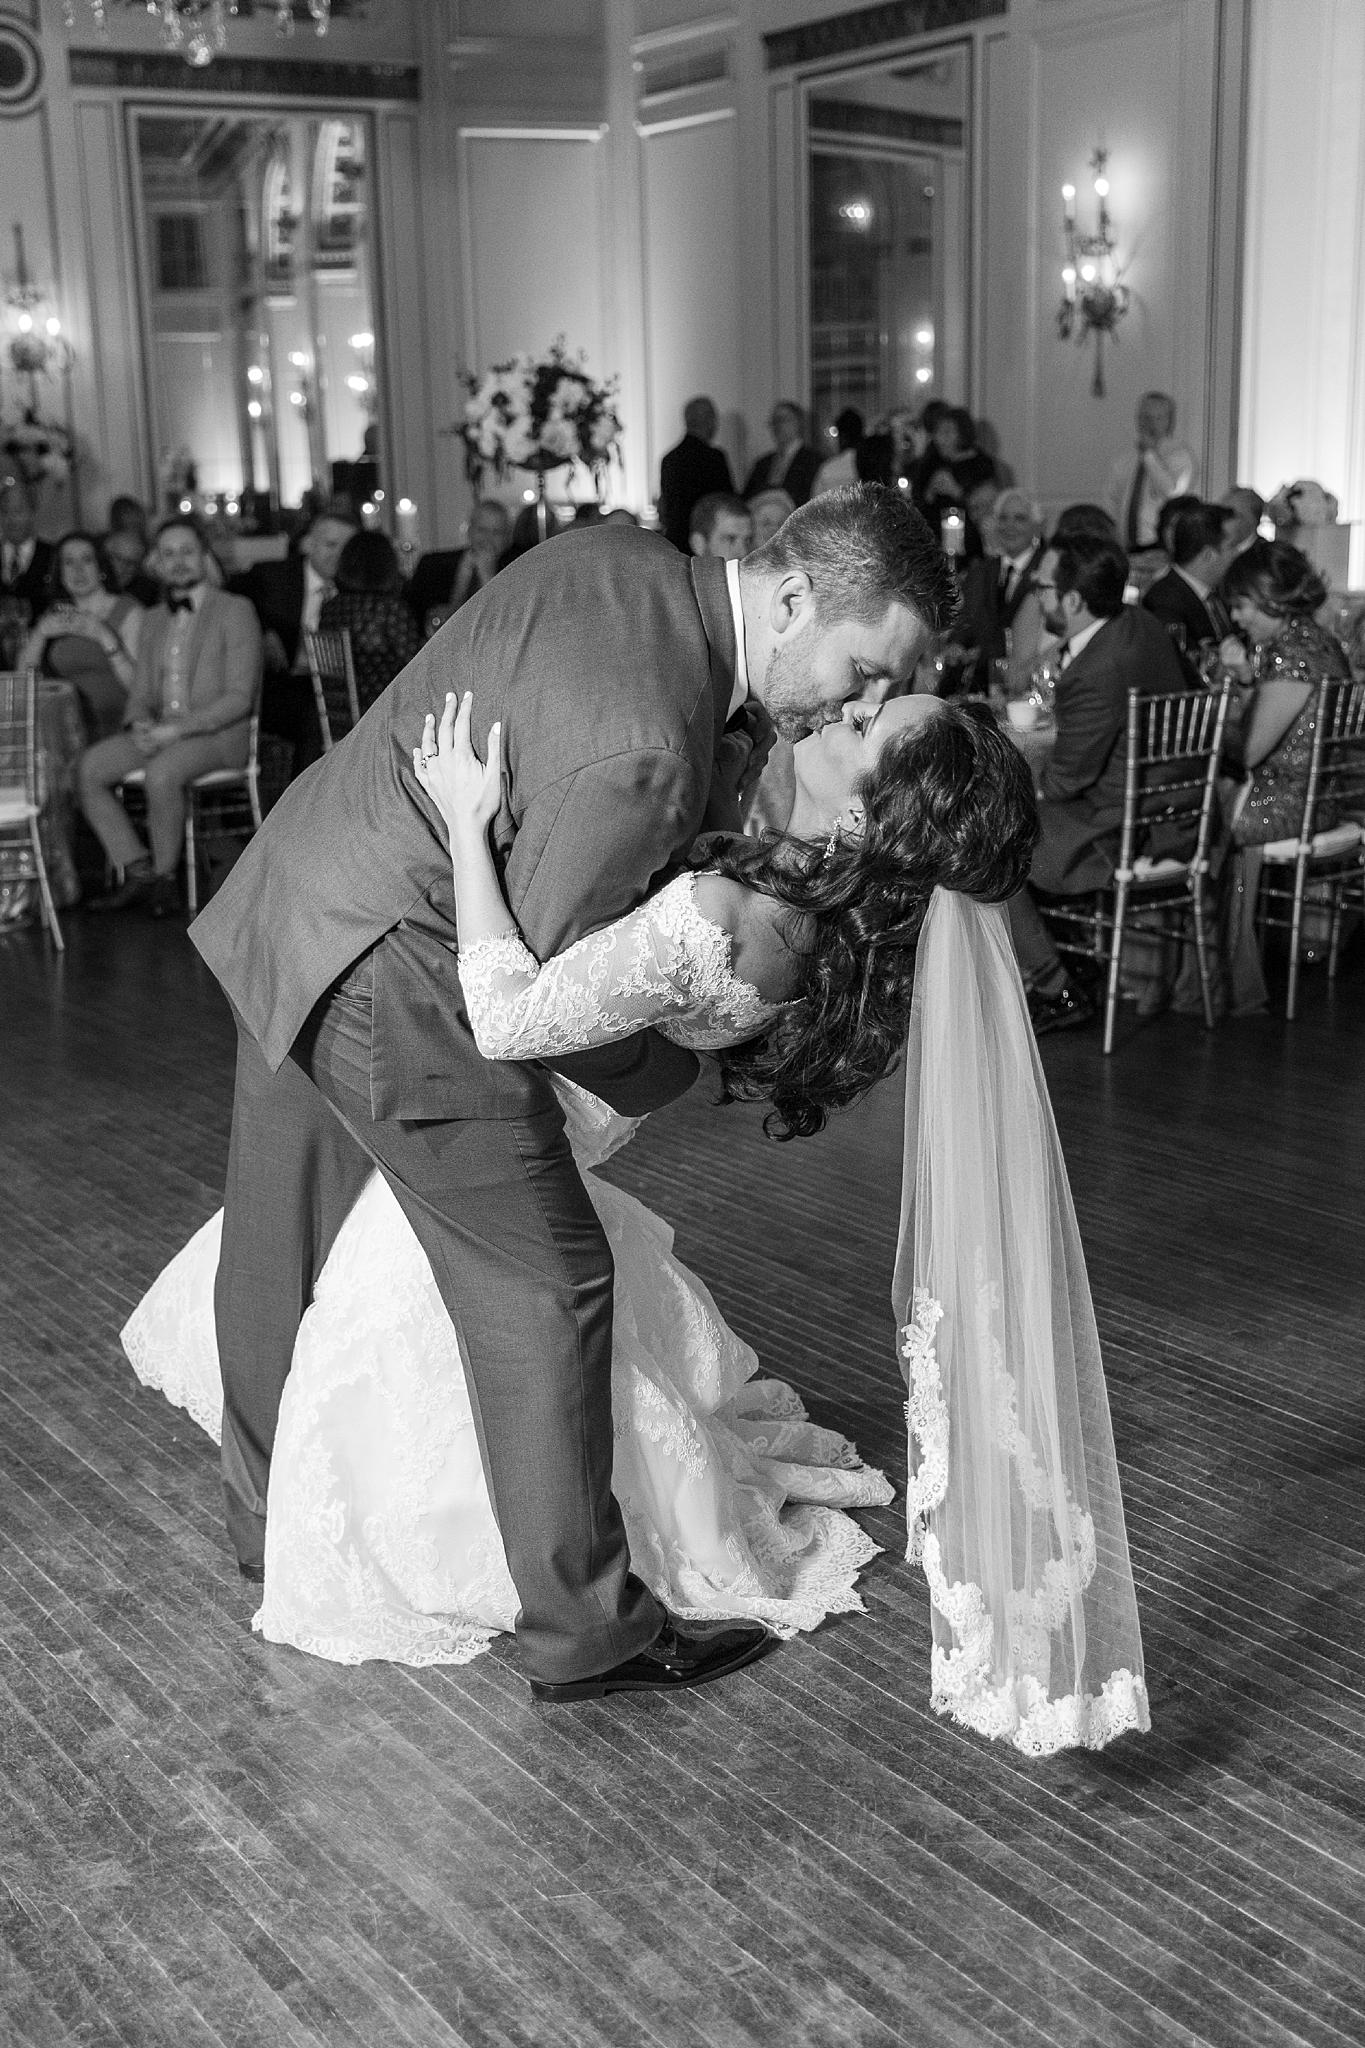 detroit-colony-club-wedding-regal-romantic-photography-in-detroit-mi-by-courtney-carolyn-photography_0001.jpg